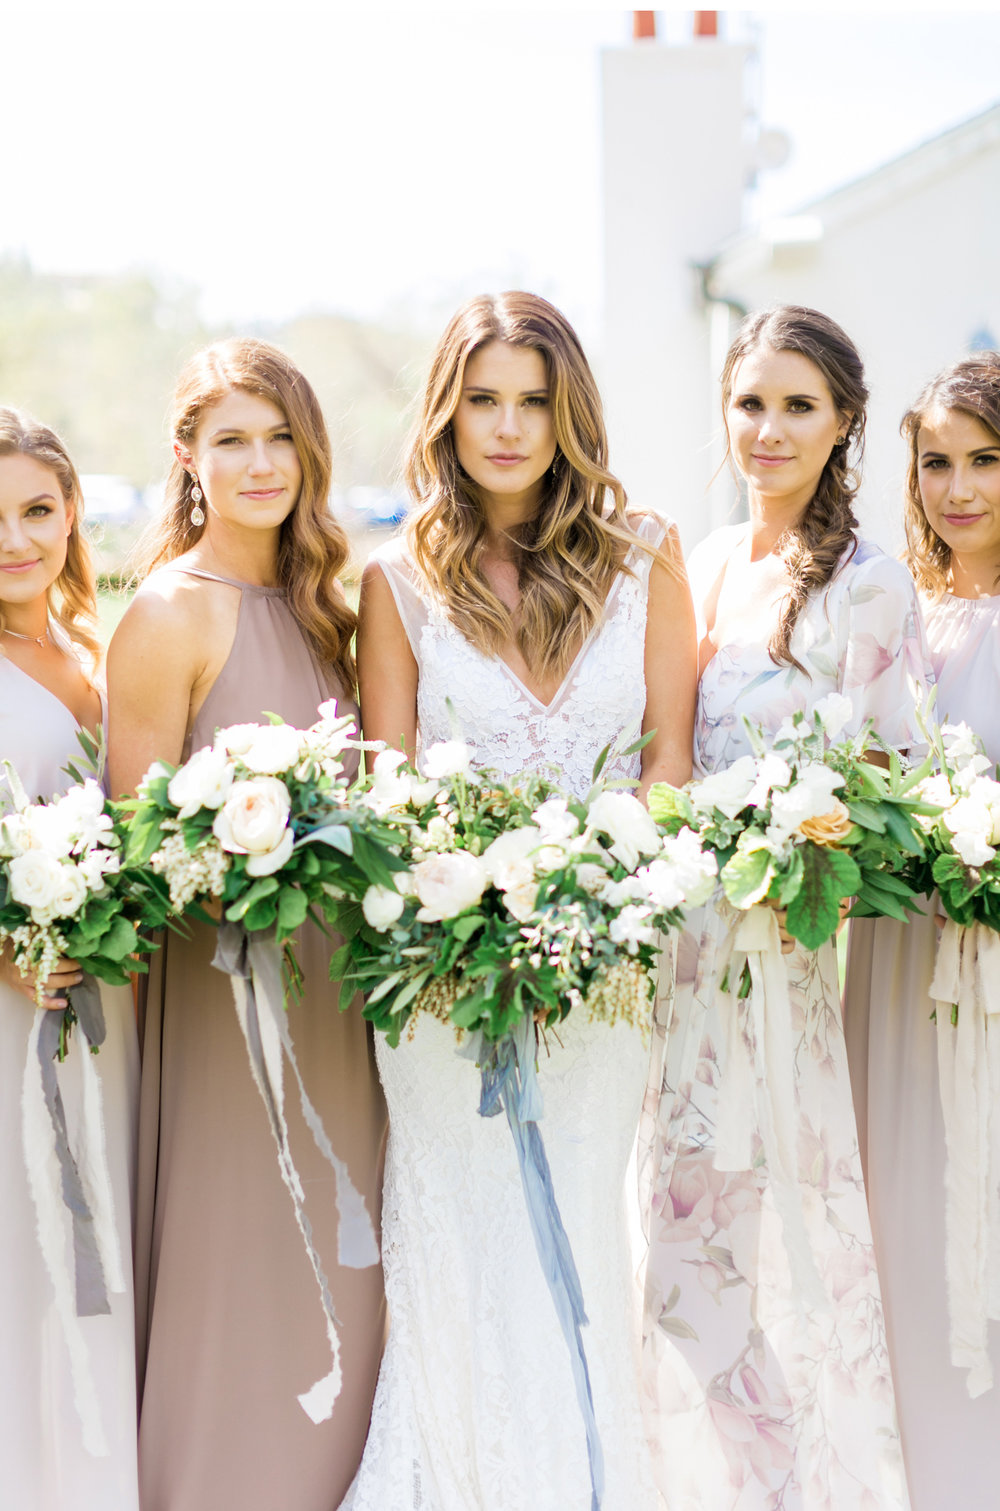 Malibu-Wedding-Photographer-Dani-Piercy-Inspired-by-This-Triunfo-Creek-Wedding-Natalie-Schutt-Photography_10.jpg